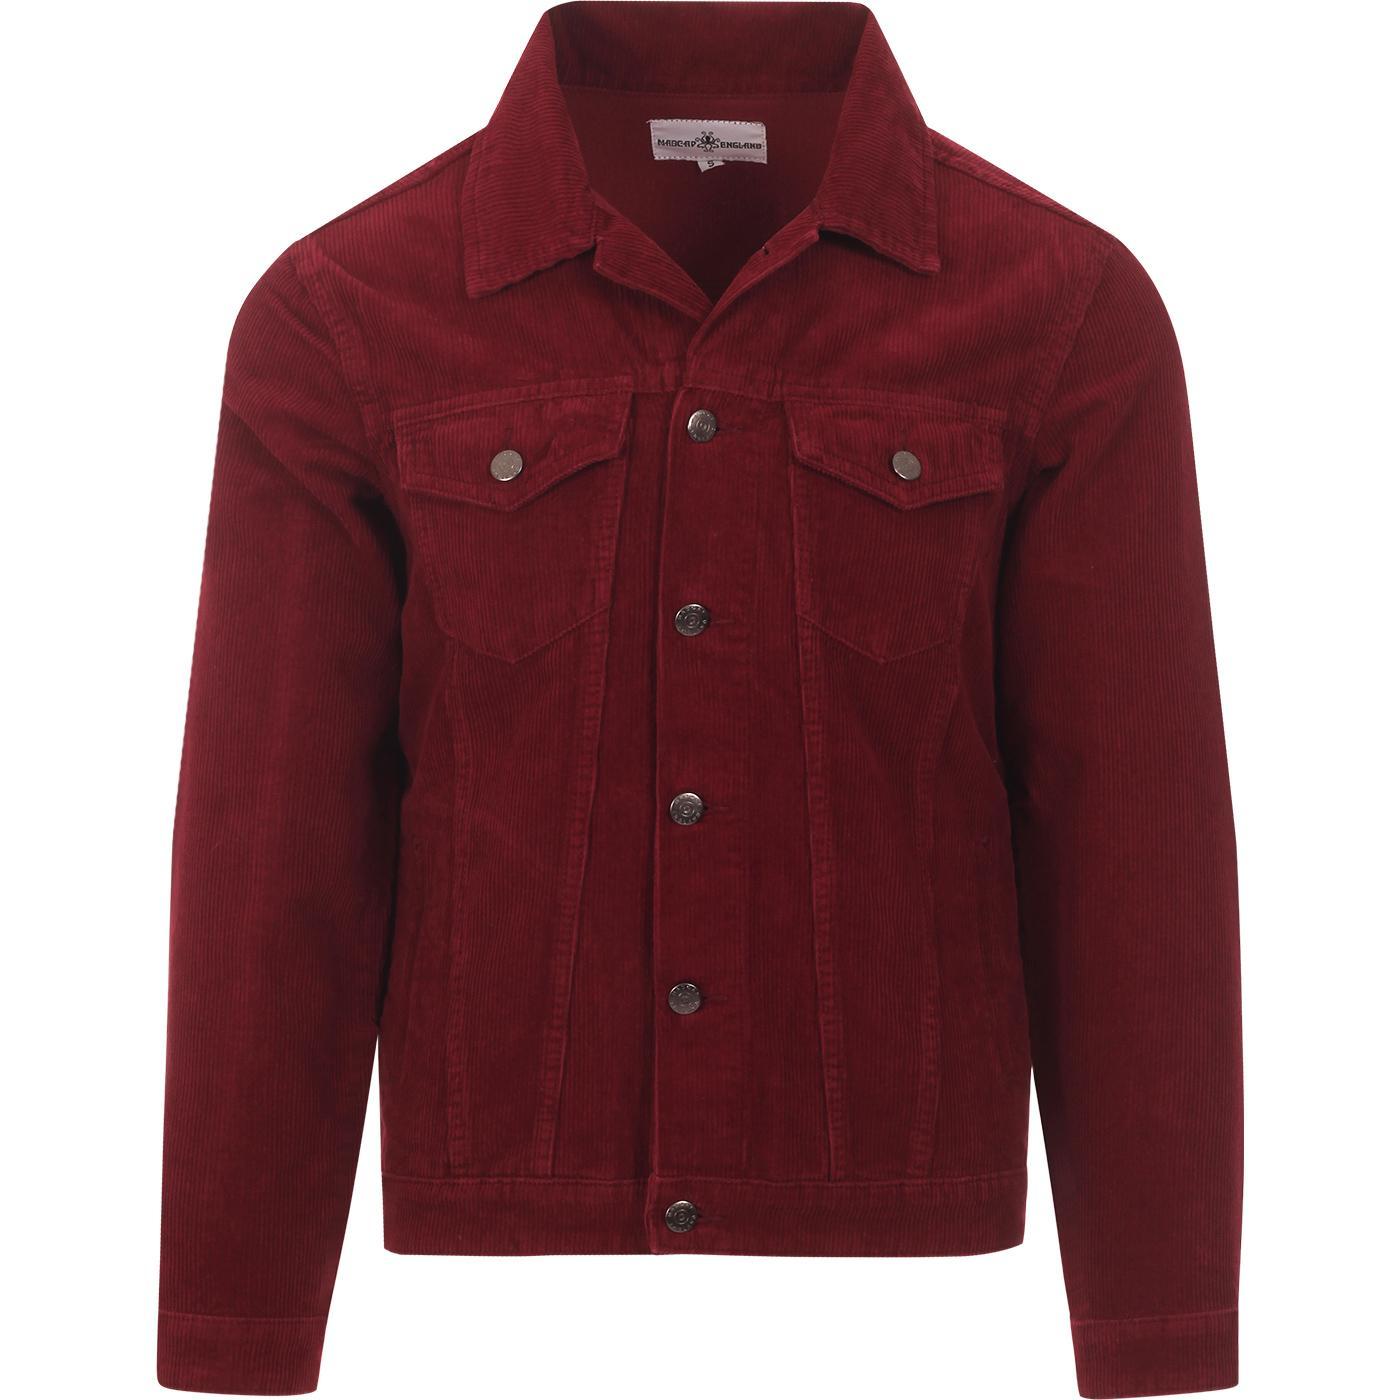 madcap england mens woburn mod cord western jacket tawny port